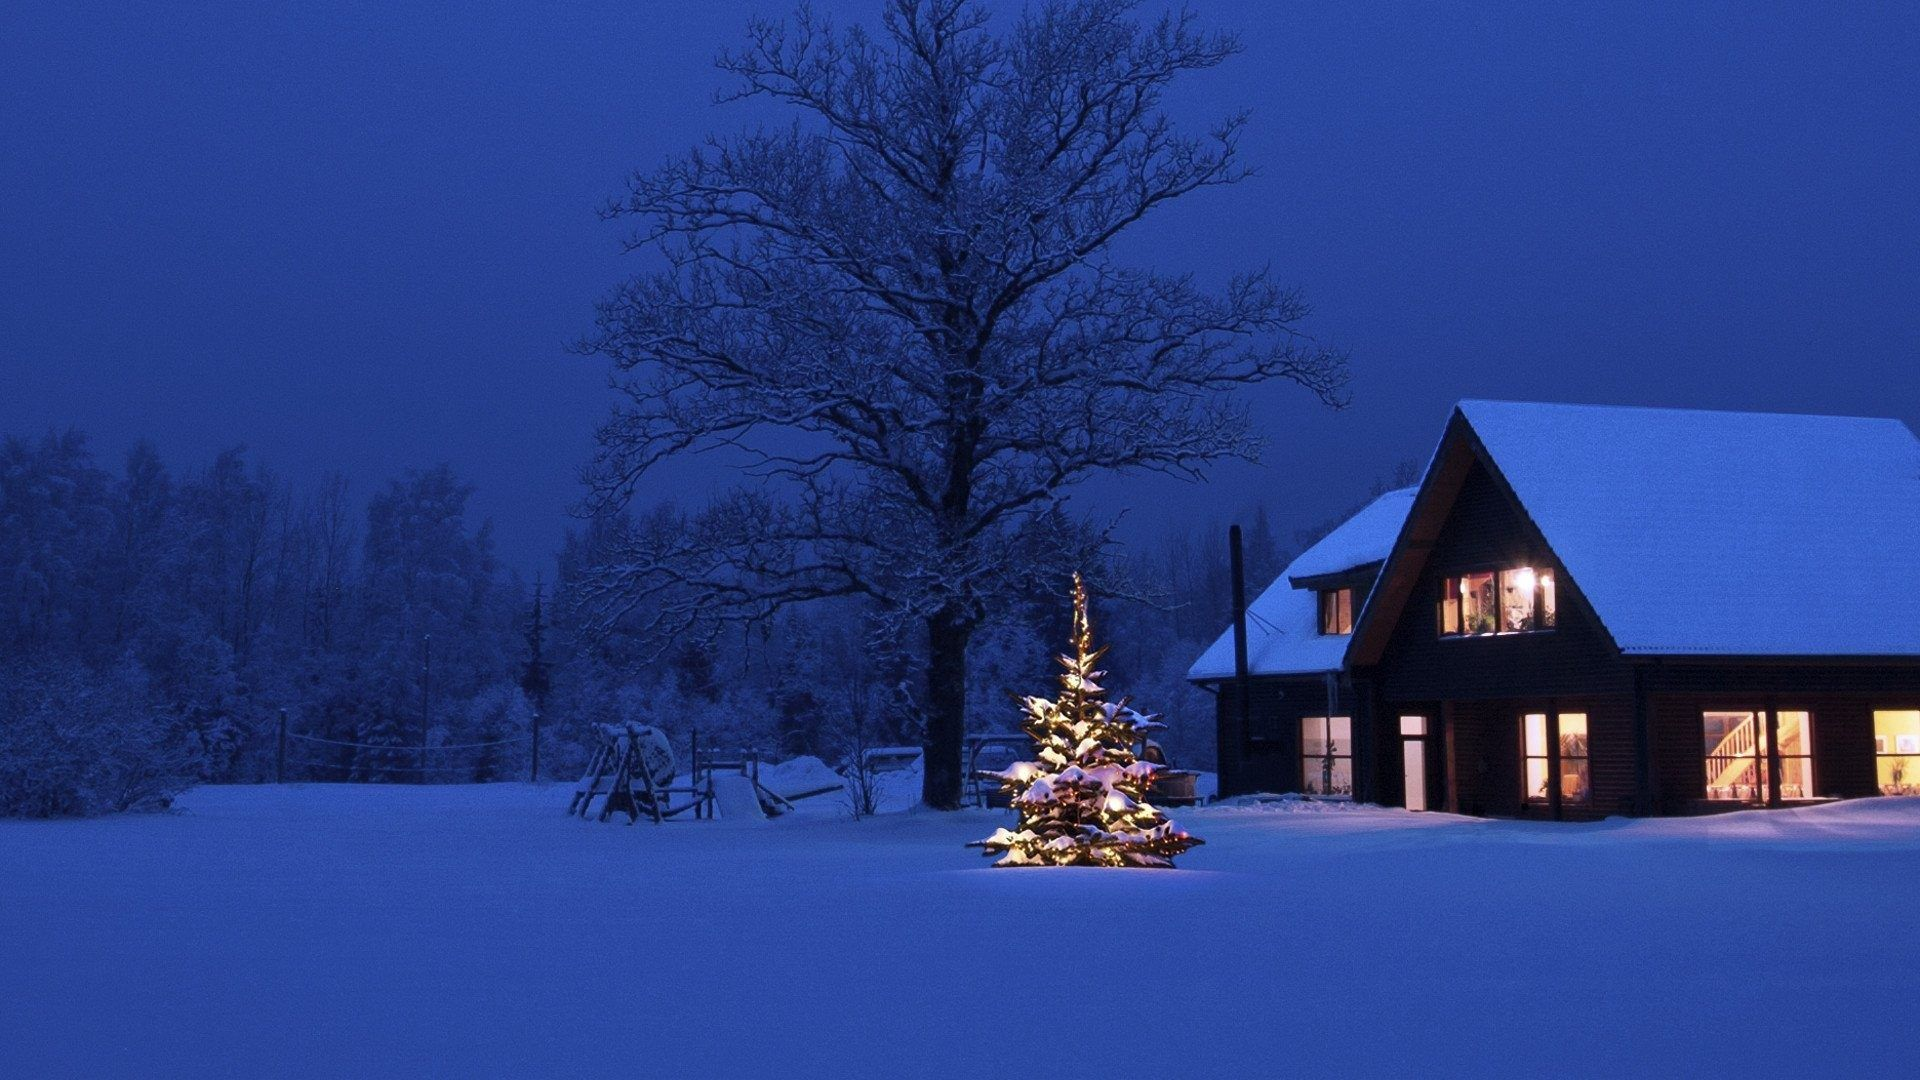 Christmas High Resolution Nature Wallpapers Top Free Christmas